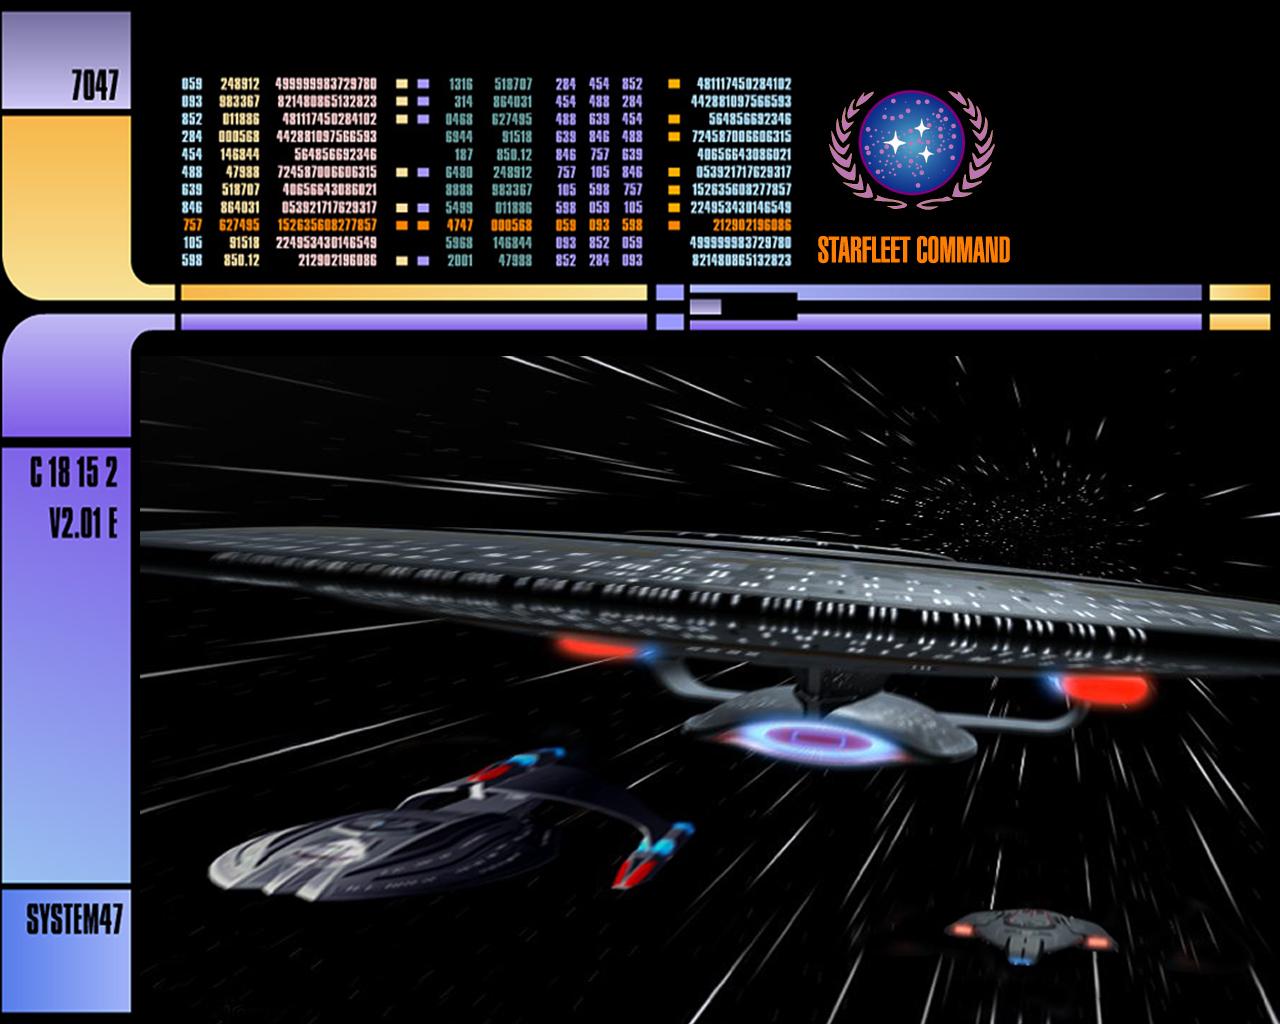 Star Trek LCARS System 47 by Unimmatrix